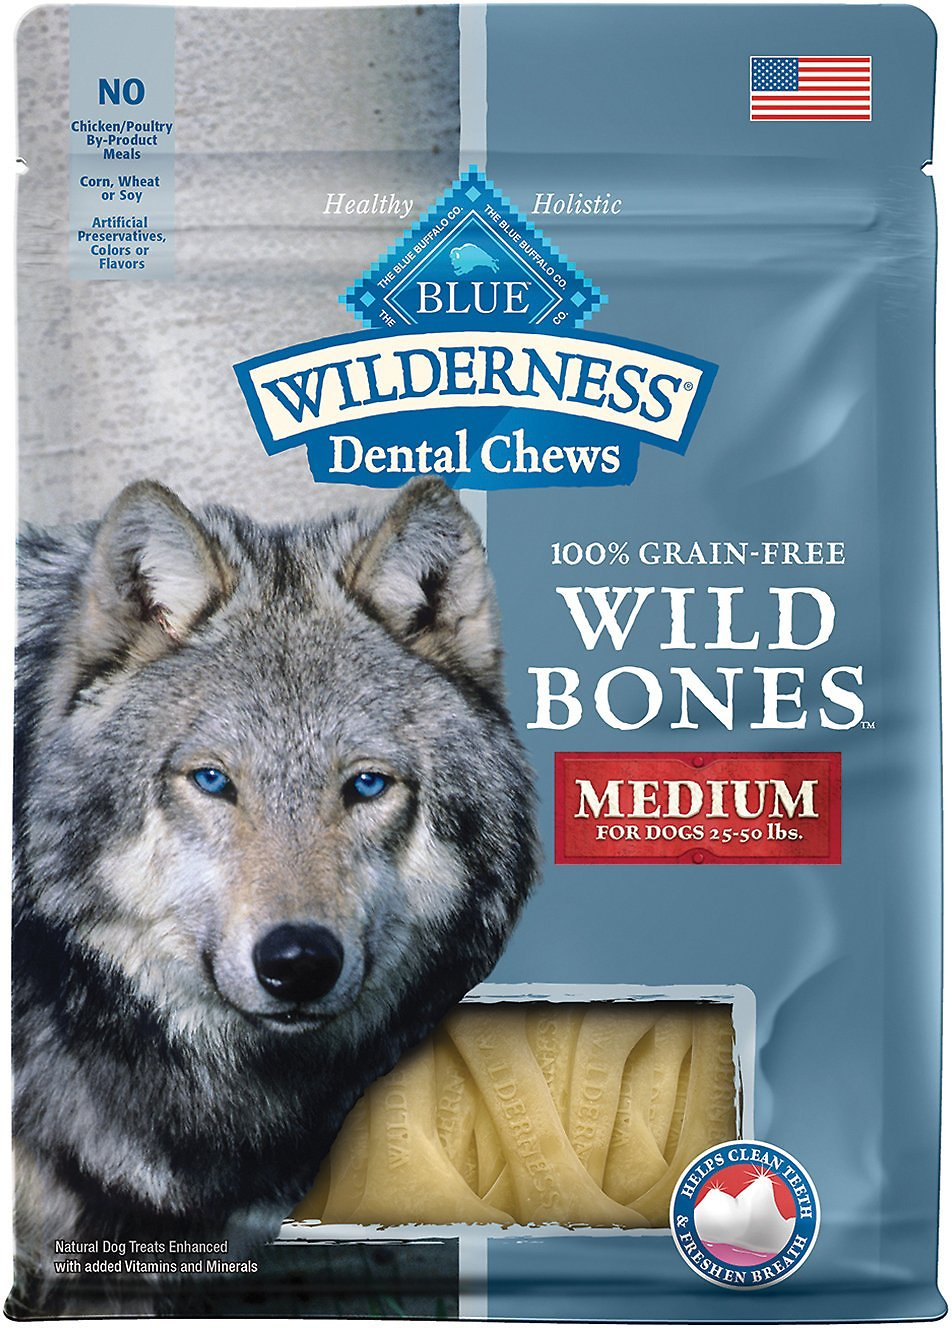 Blue Buffalo Wilderness Wild Bones Medium Dental Chews Grain-Free Dog Treats, 10-oz bag